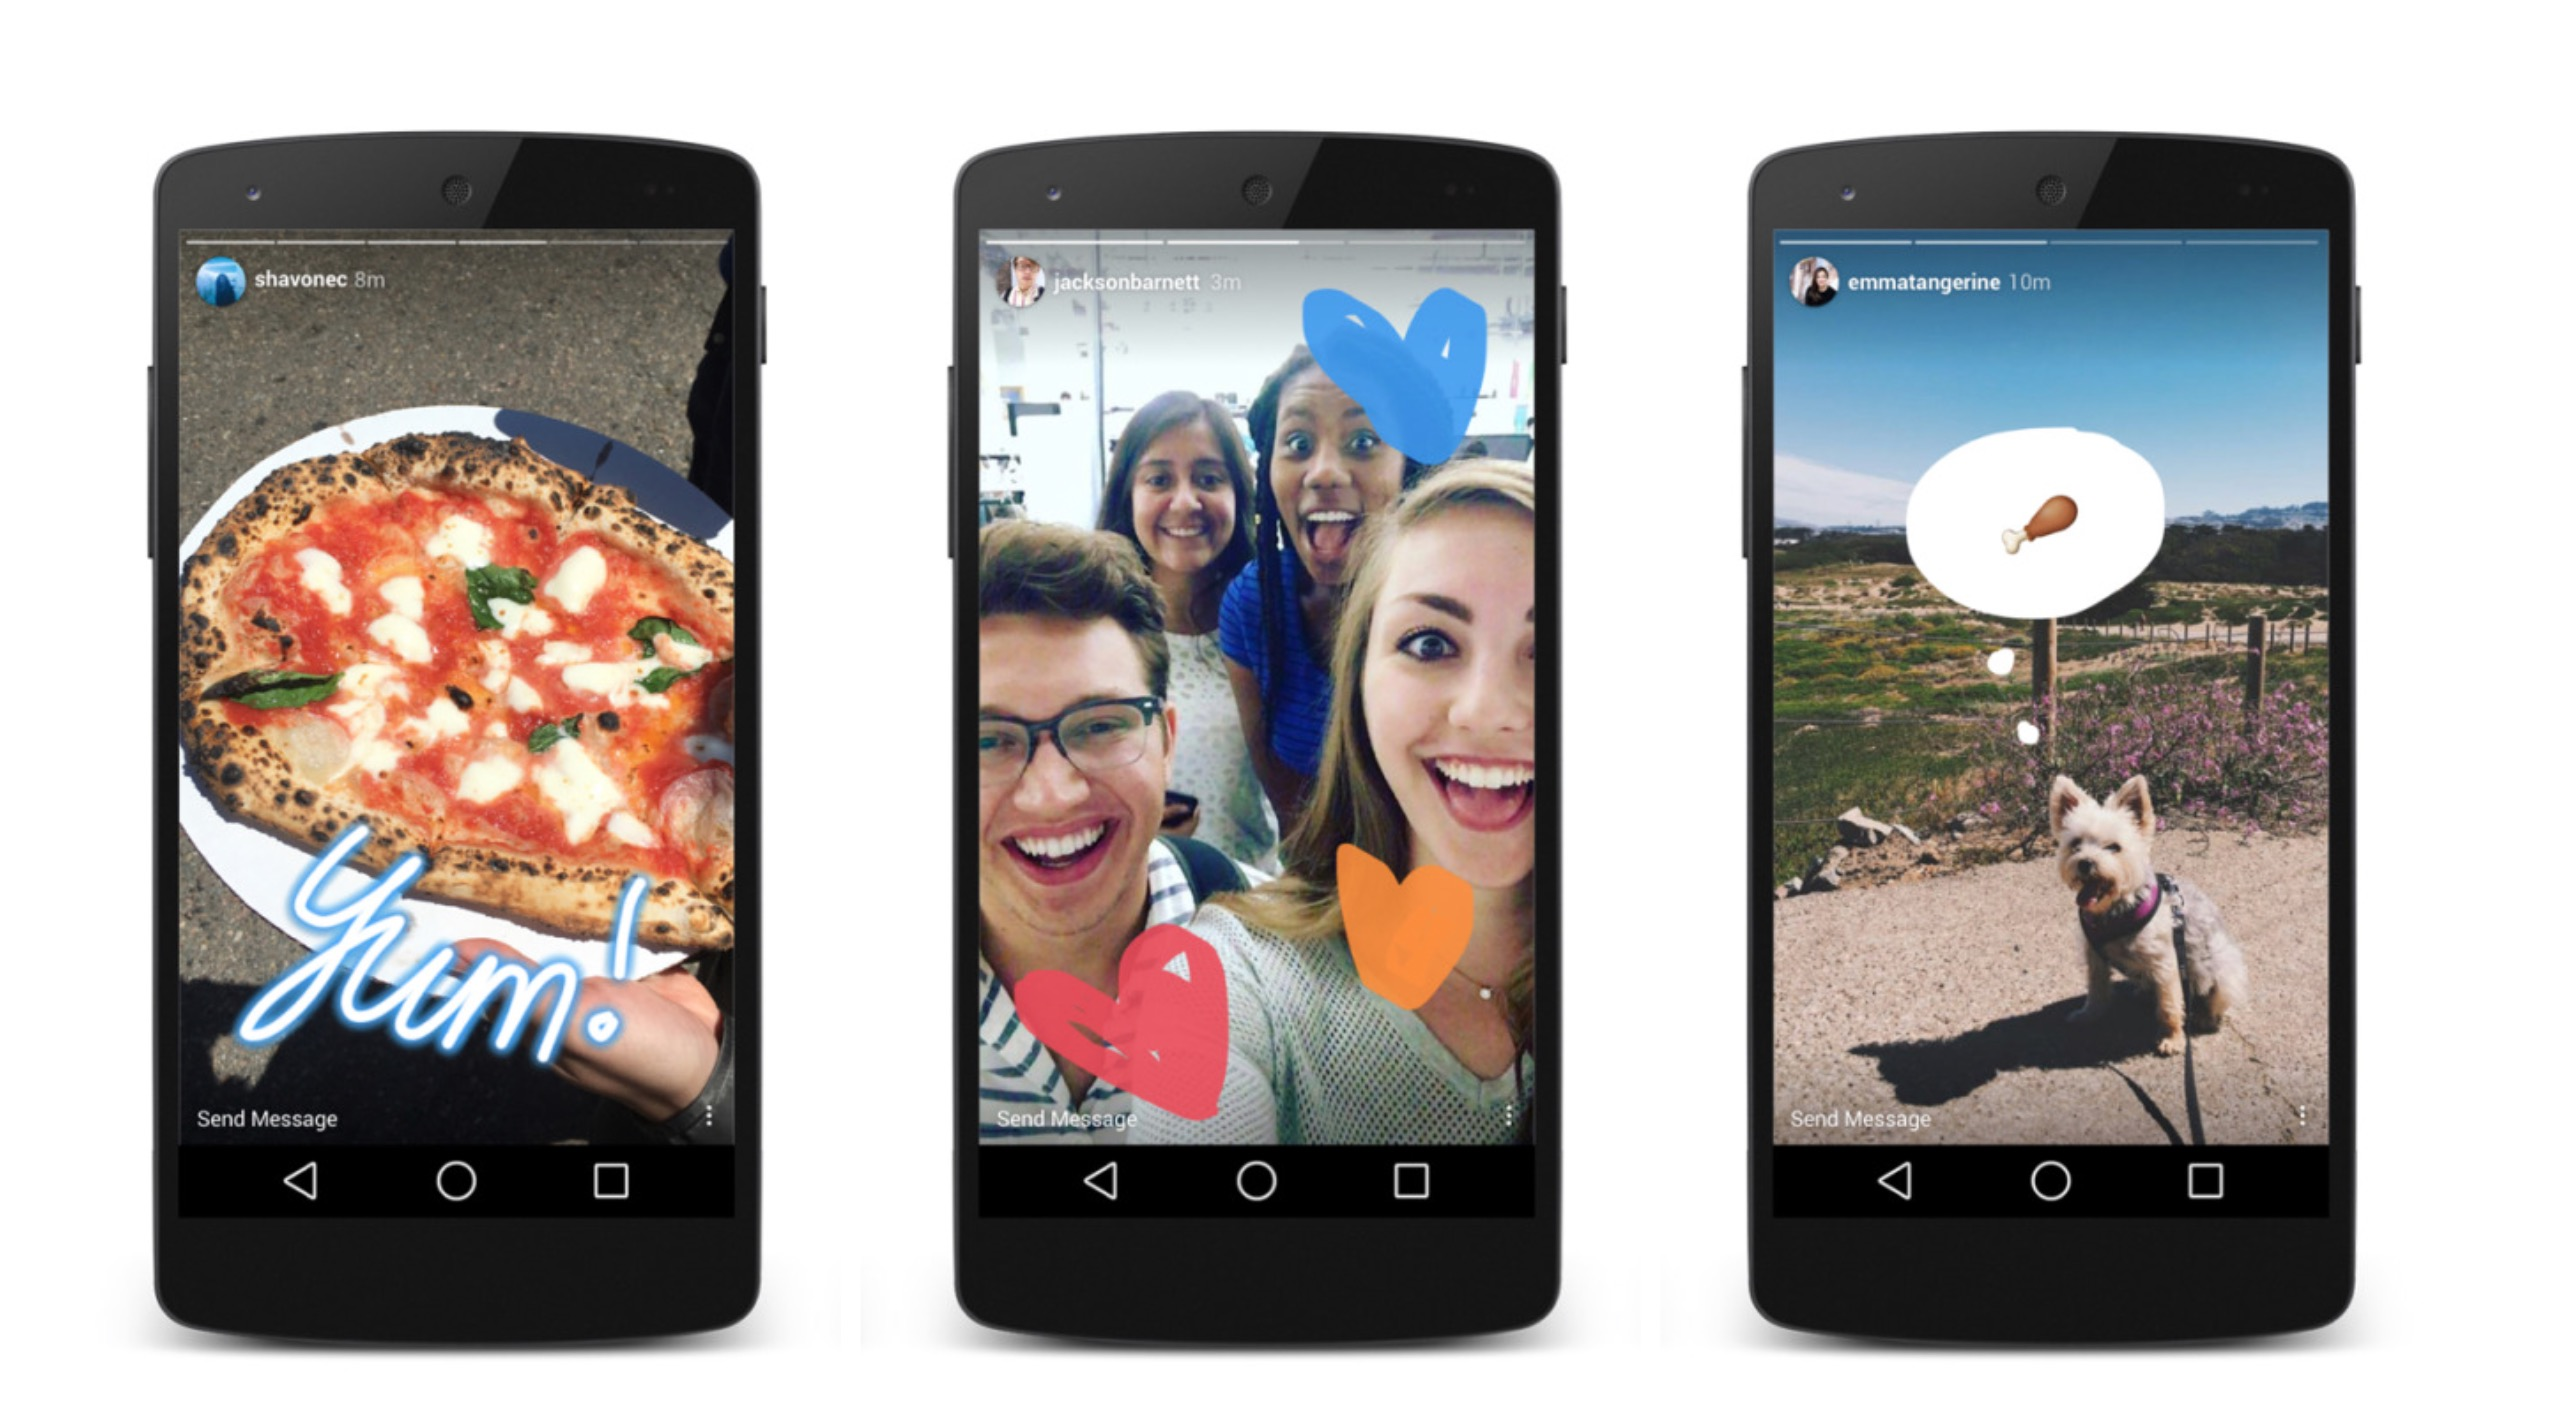 Storie Instagram su smartphone